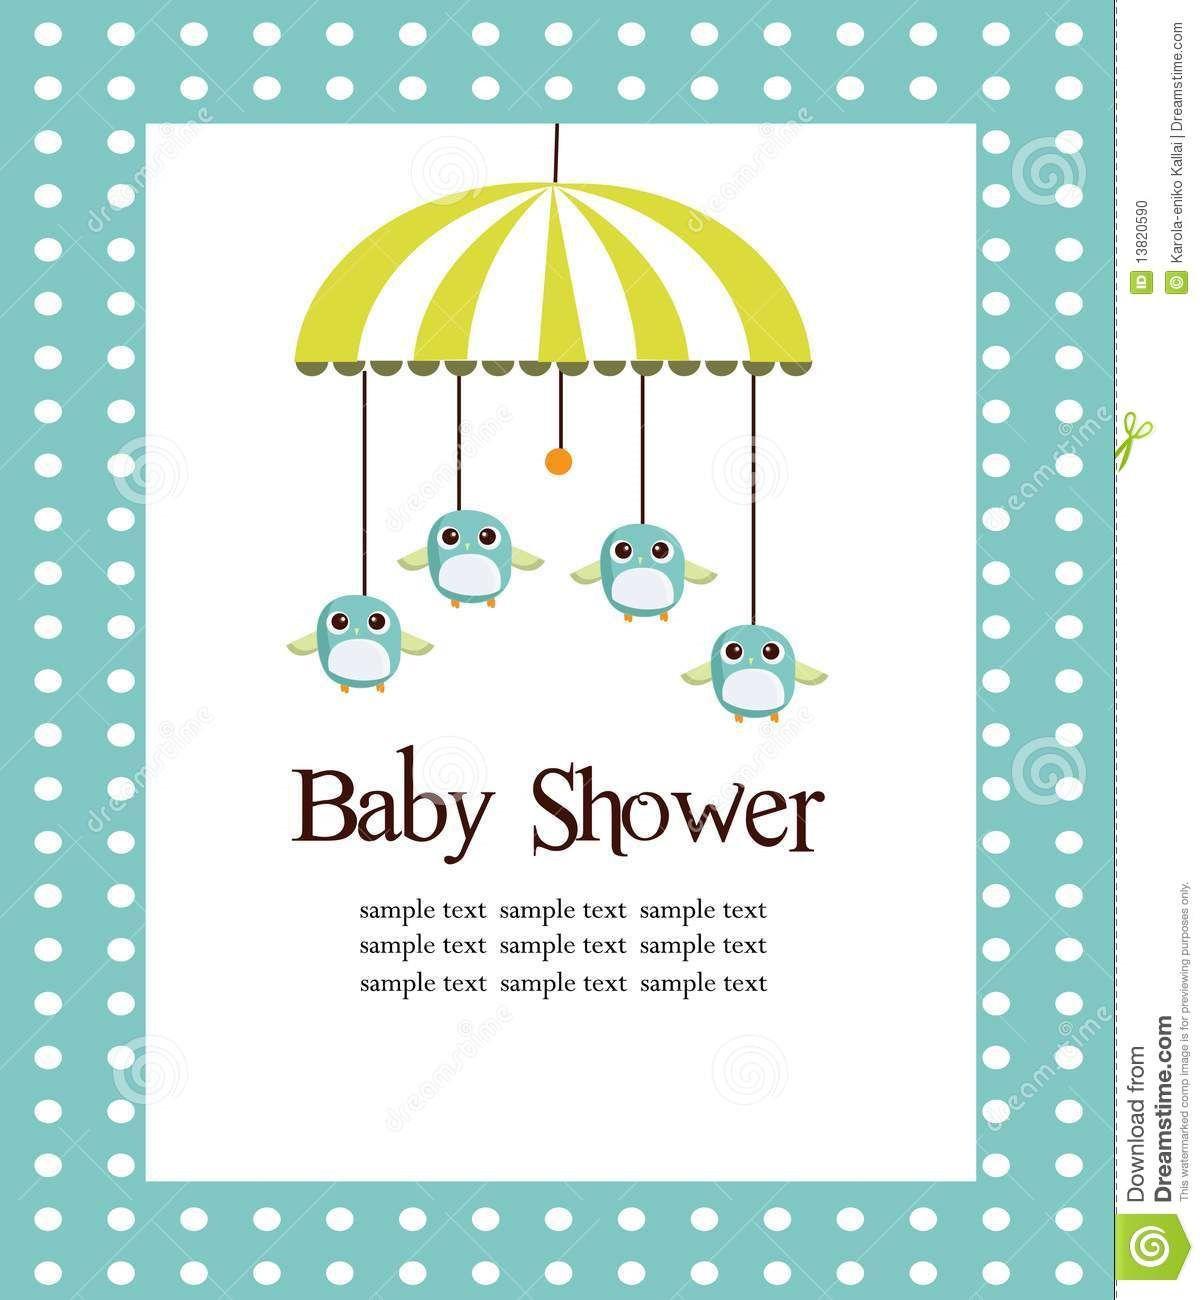 008 Impressive Free Printable Baby Shower Card For Boy Highest Quality  BingoFull